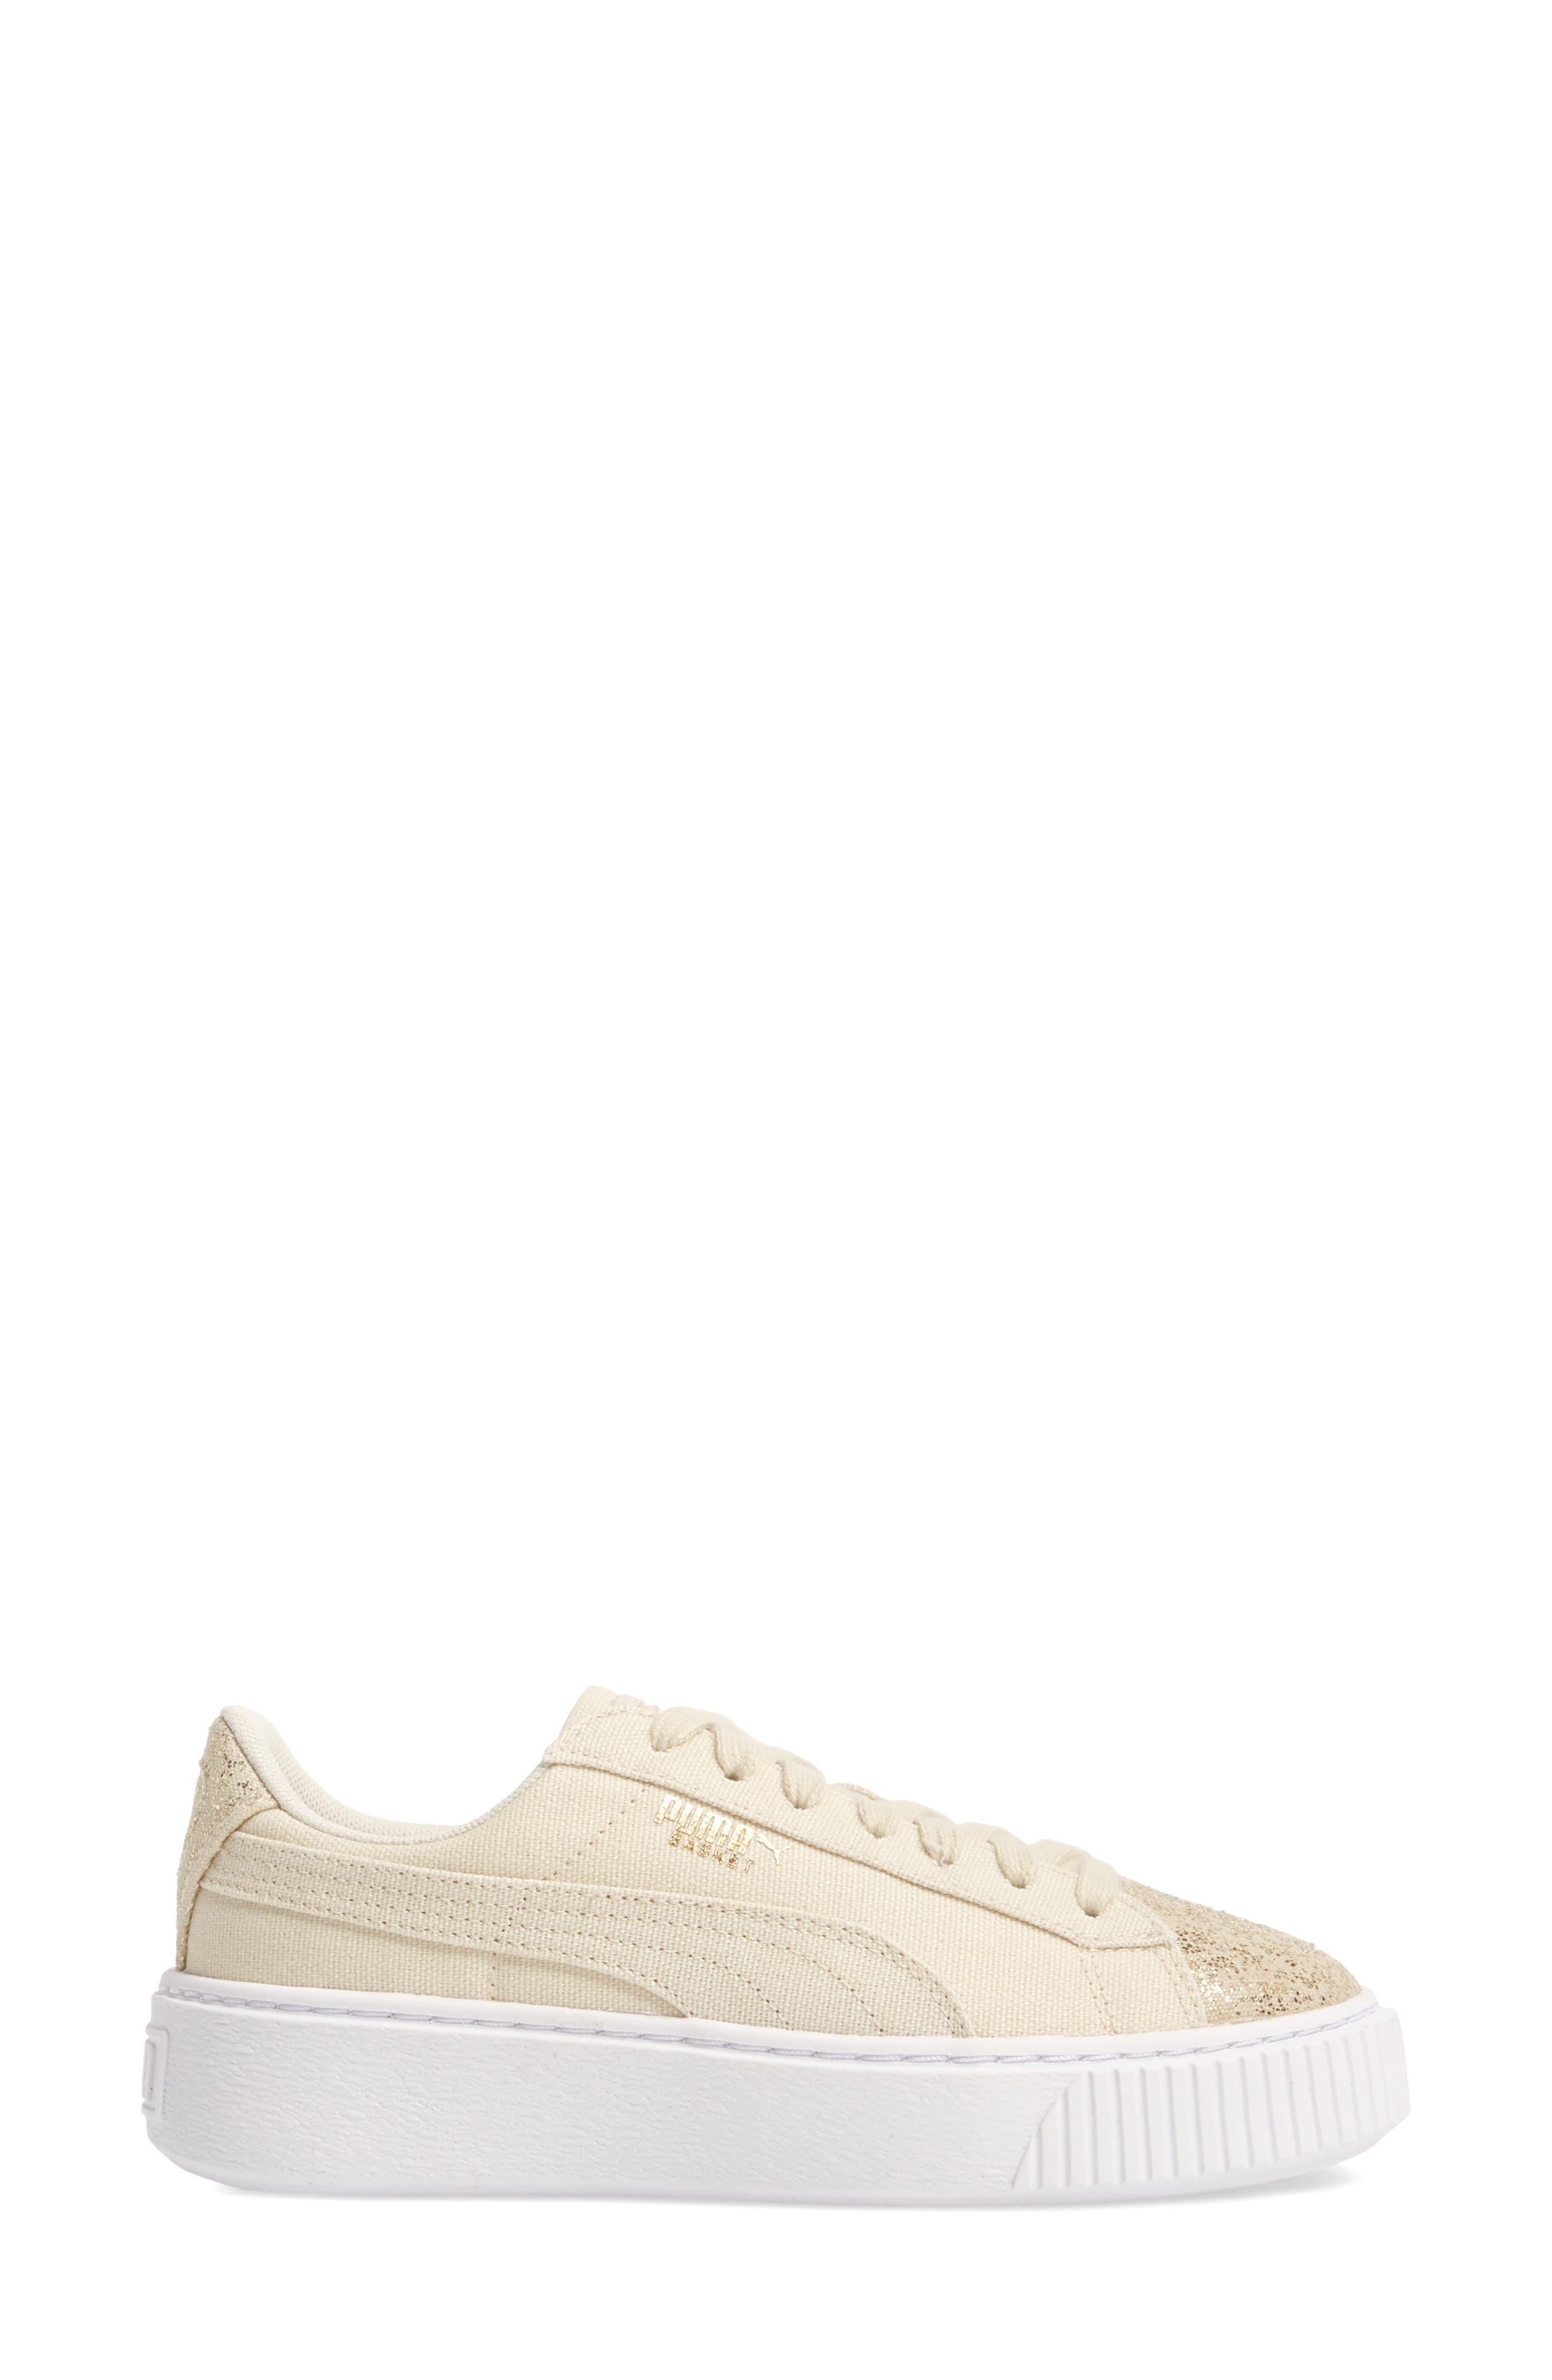 Basket Platform Sneaker,                             Alternate thumbnail 3, color,                             282